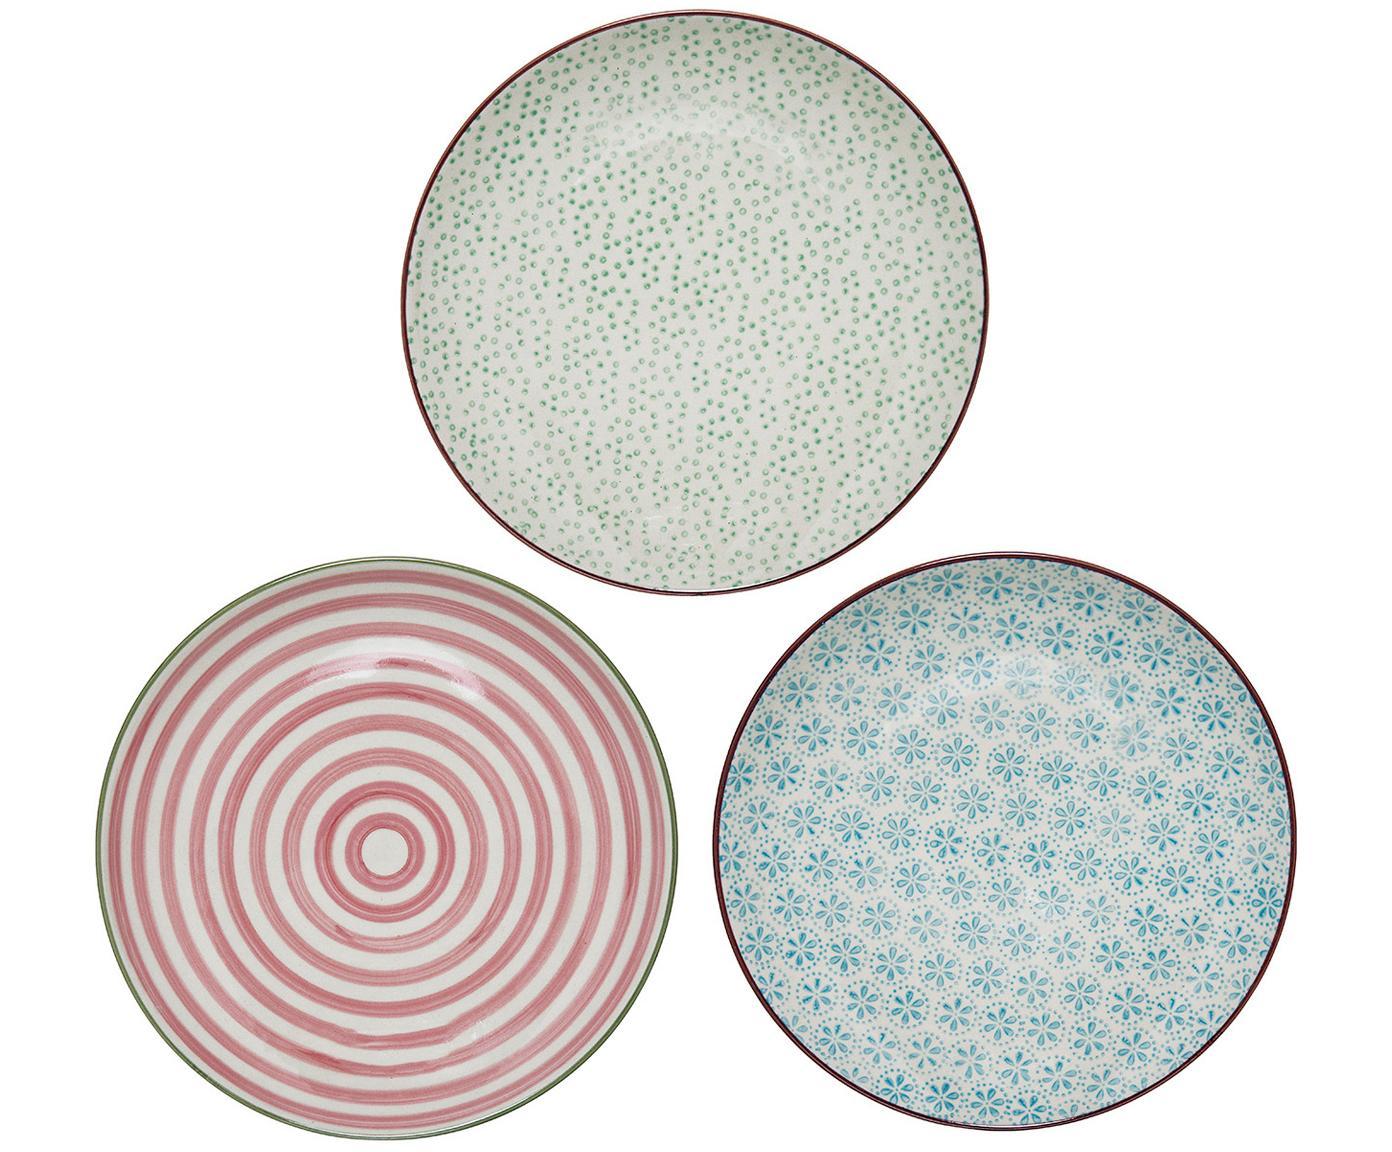 Set de platos postre Patrizia, 3pzas., Gres, Blanco, verde, rojo, azul, Ø 20 cm